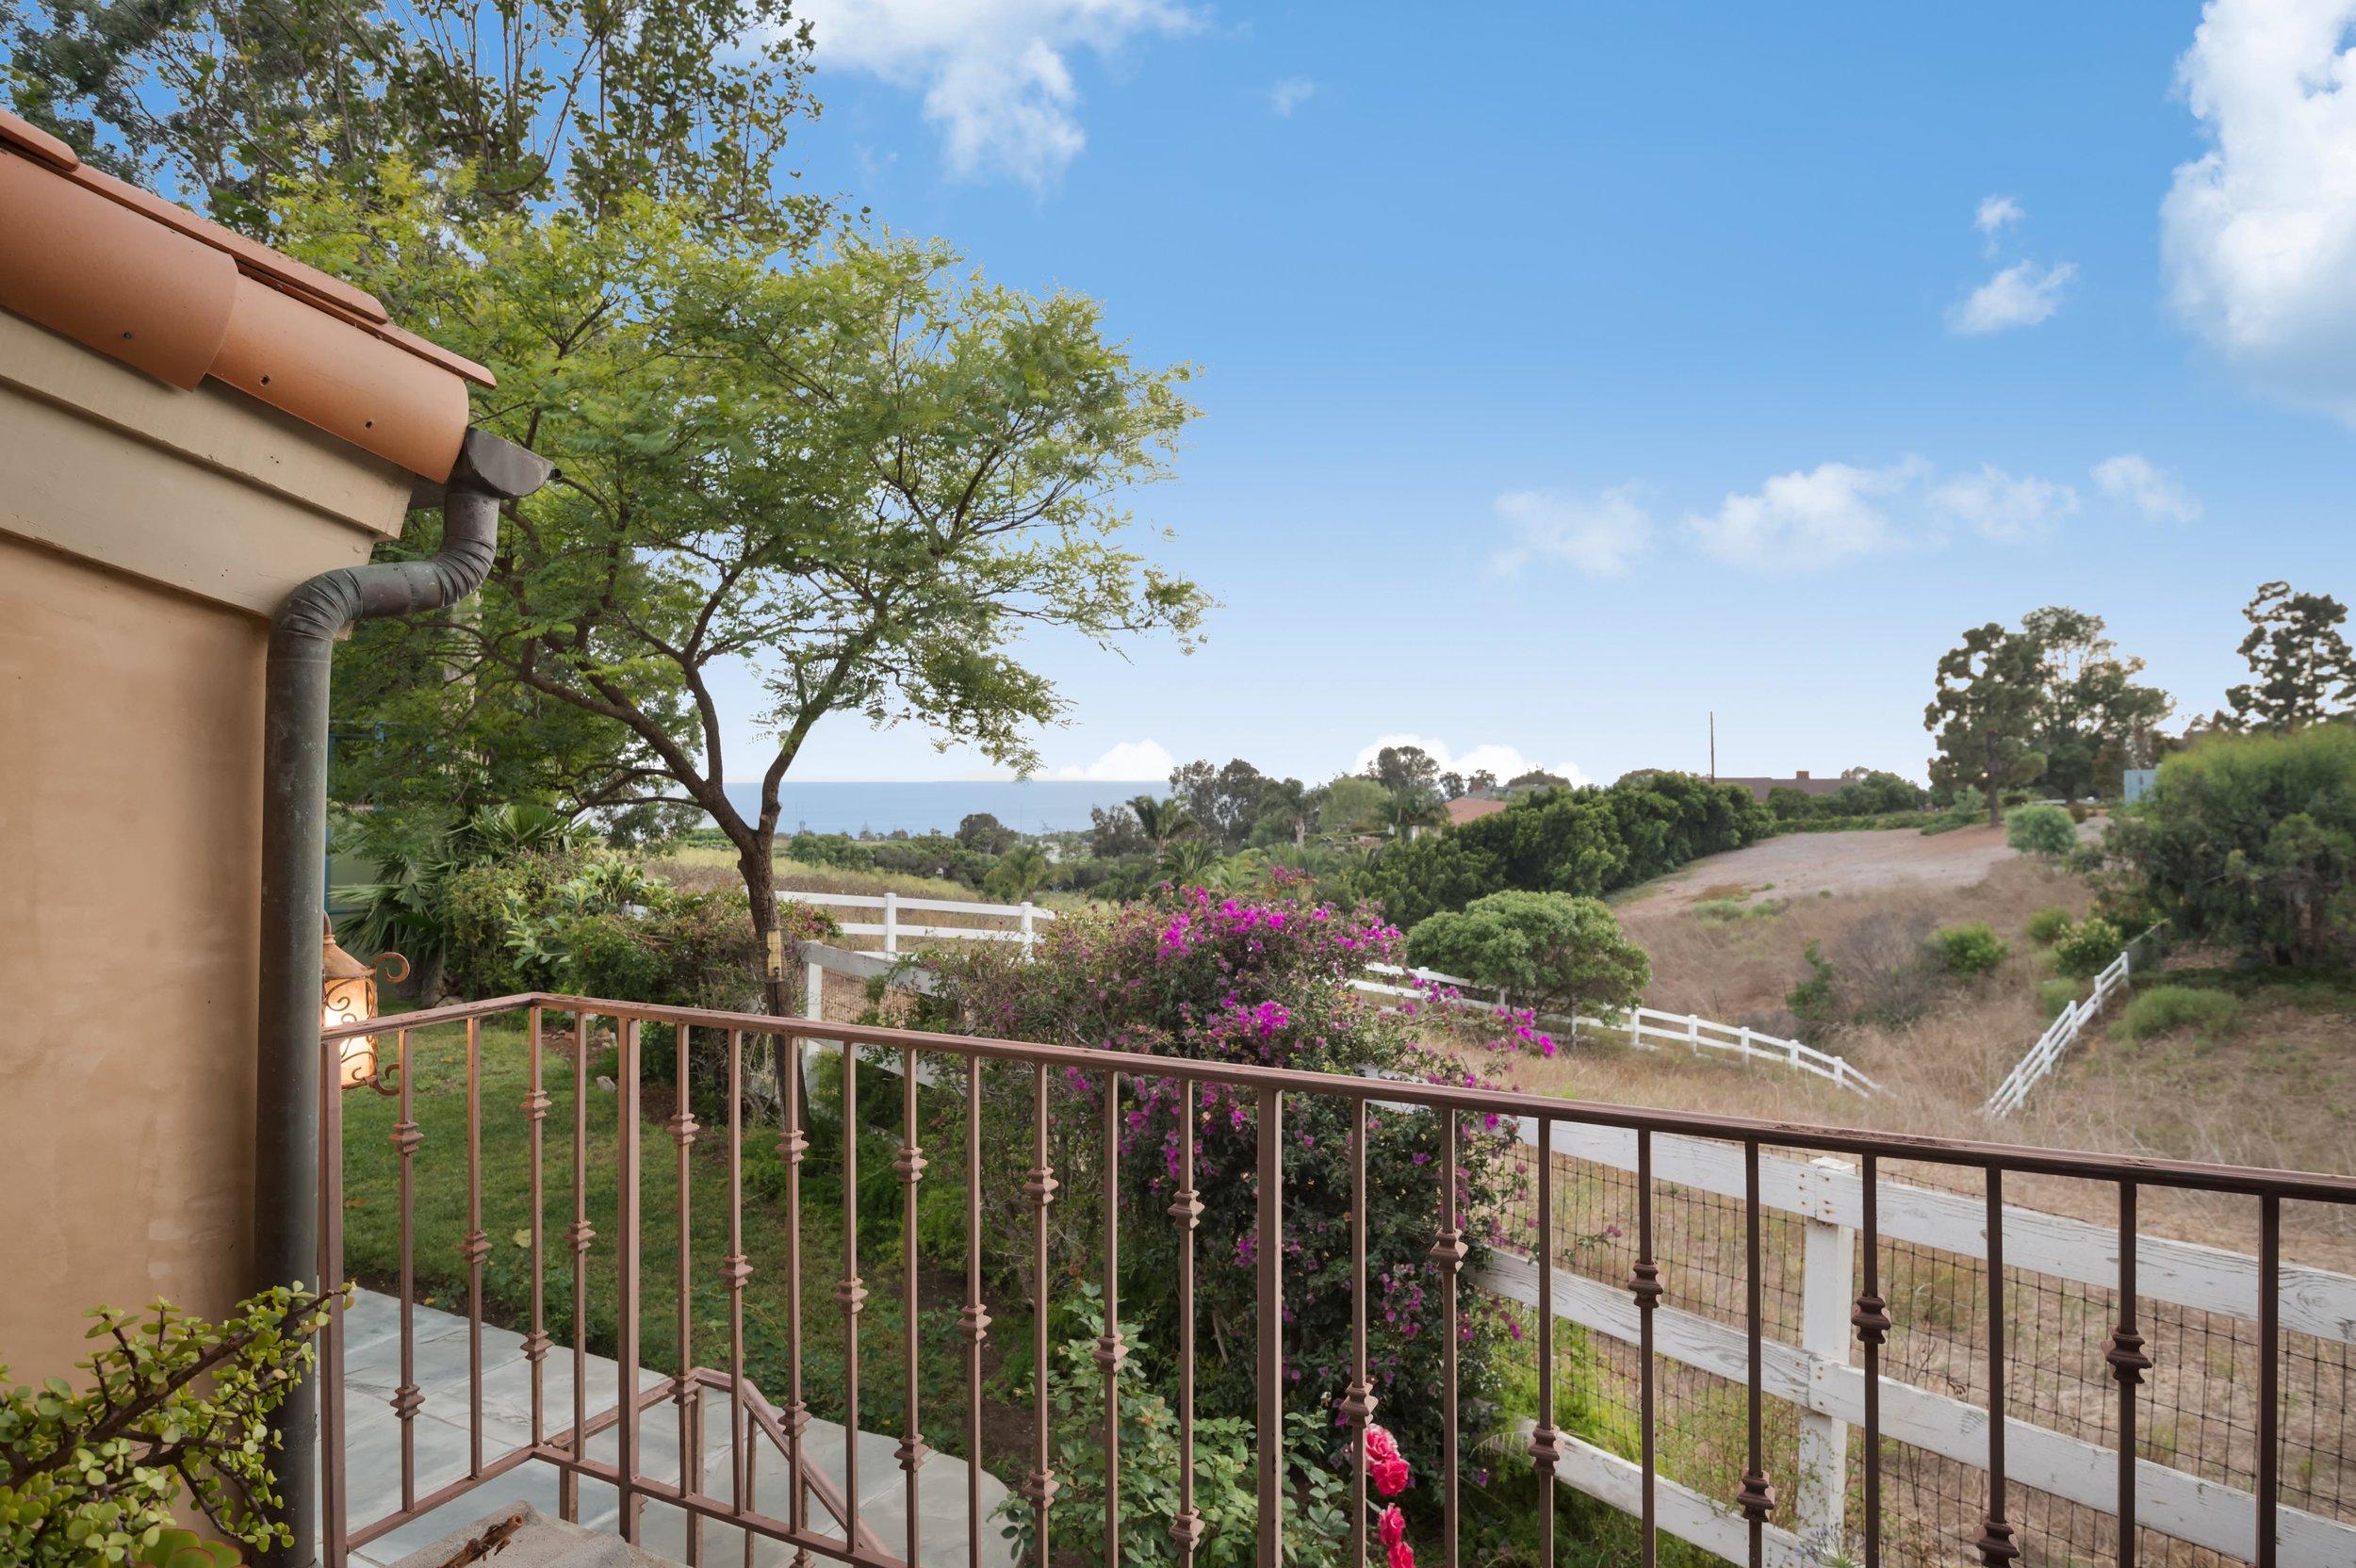 024 guest house 29660 Harvester Road Malibu For Sale The Malibu Life Team Luxury Real Estate.jpg